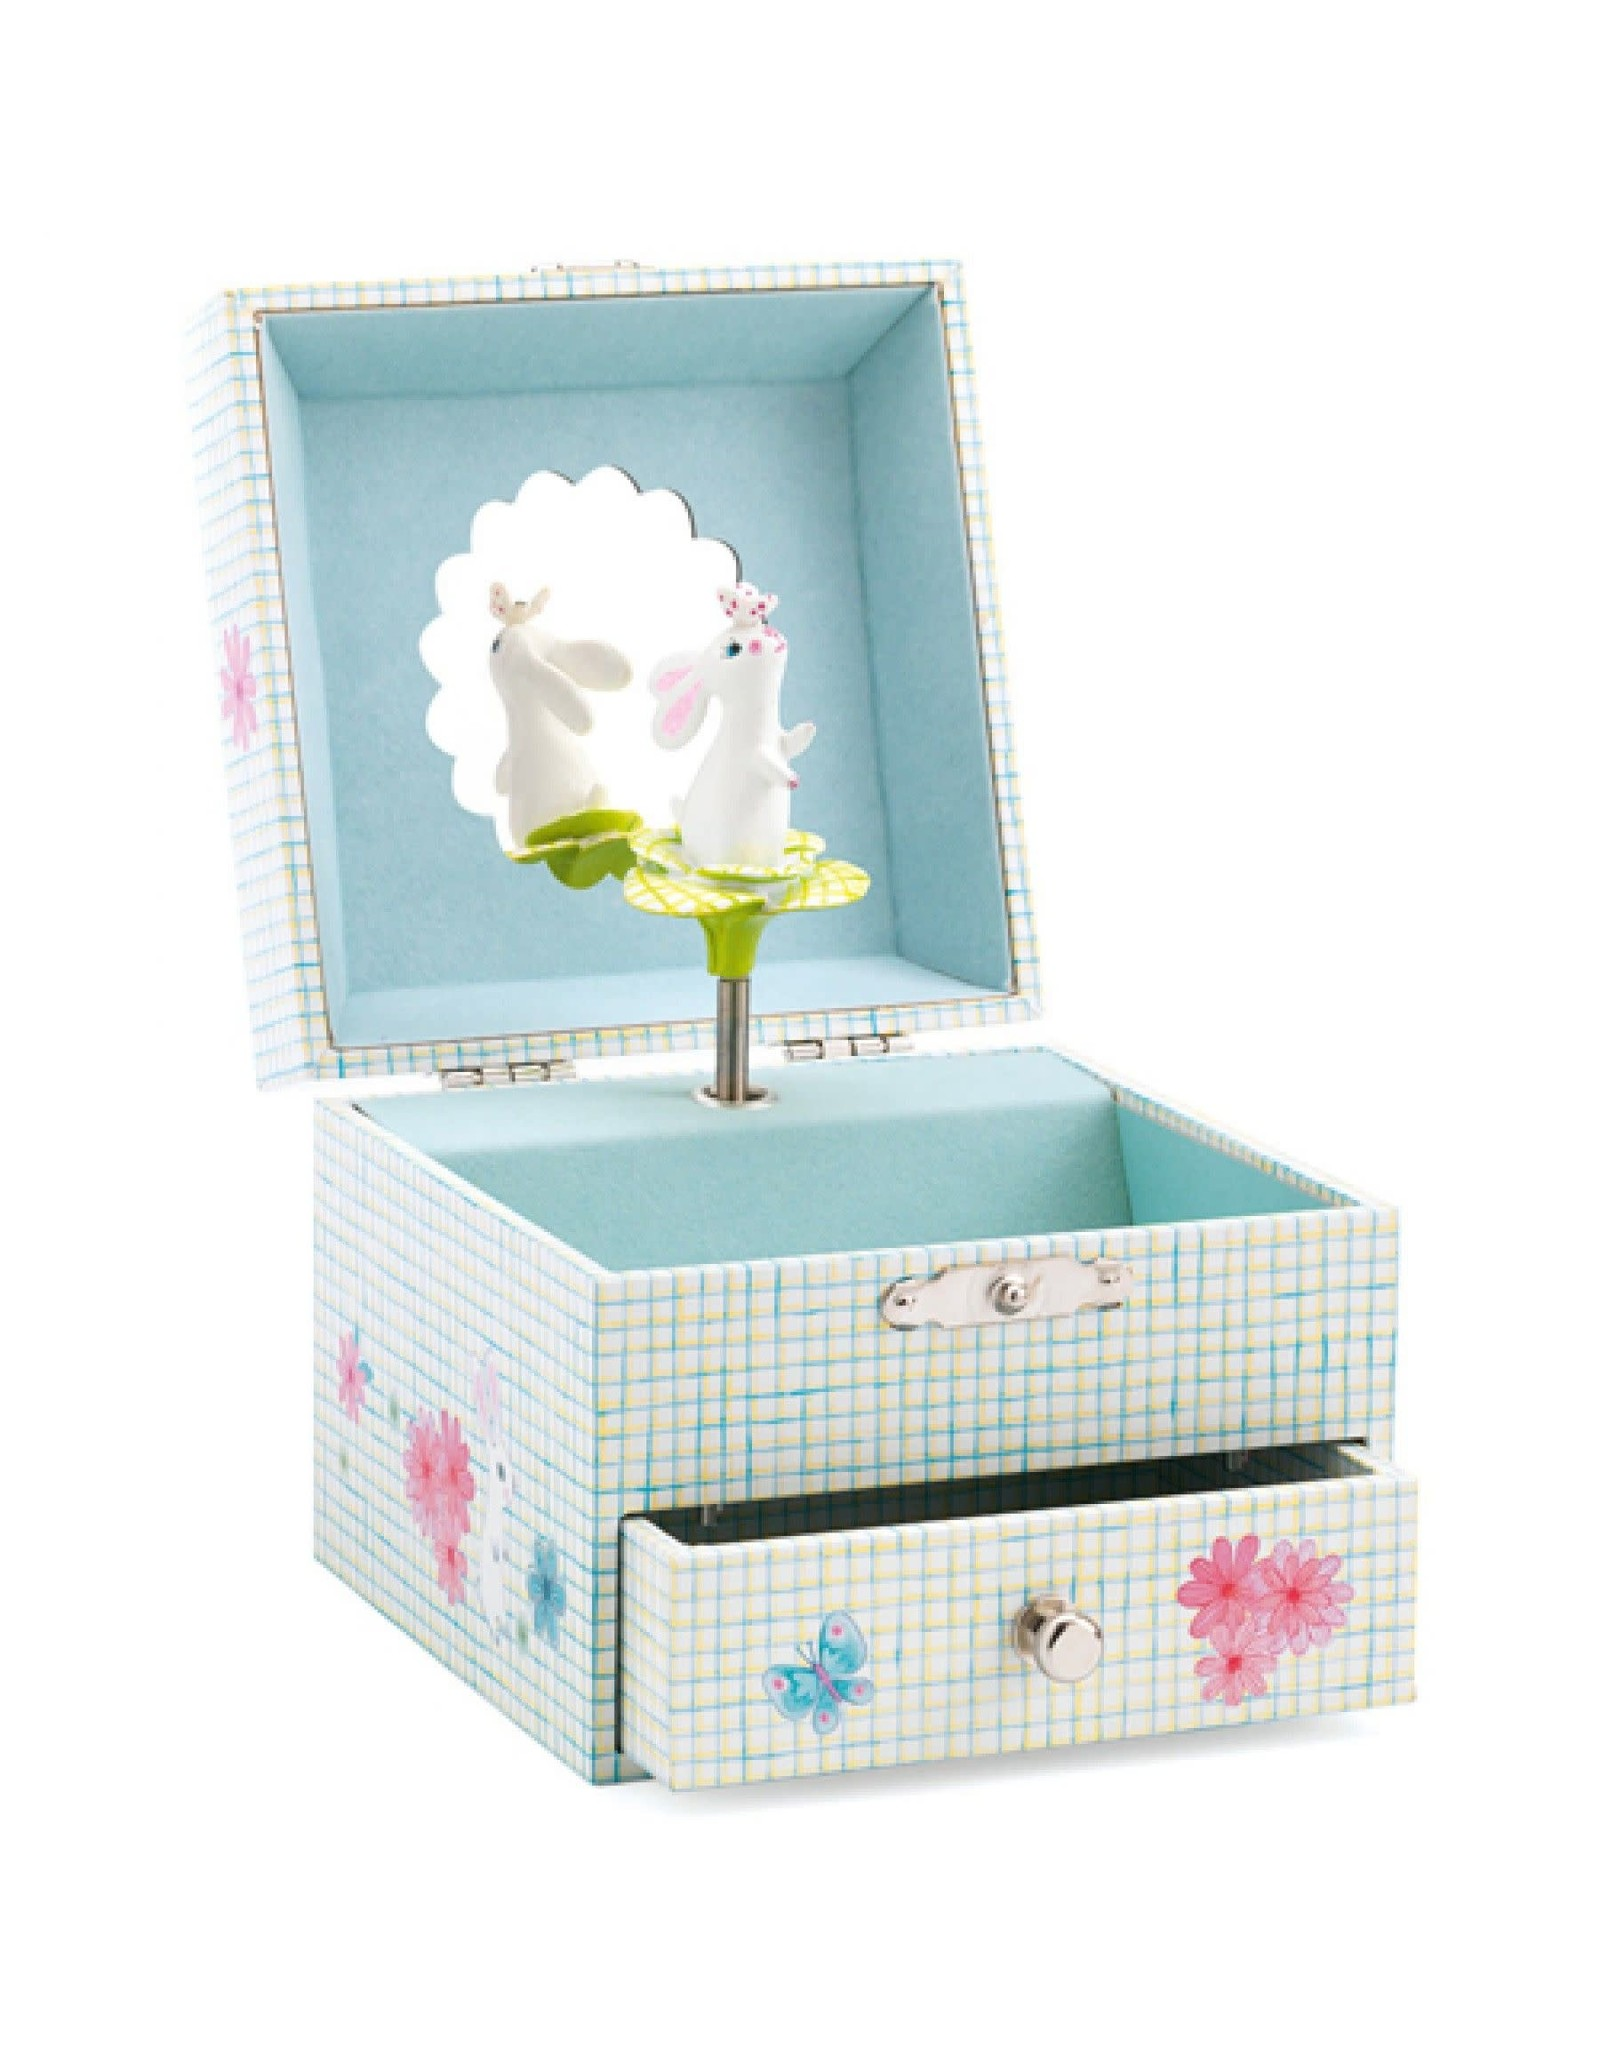 Djeco Sweet Rabbit's Song Musical Jewellery Box